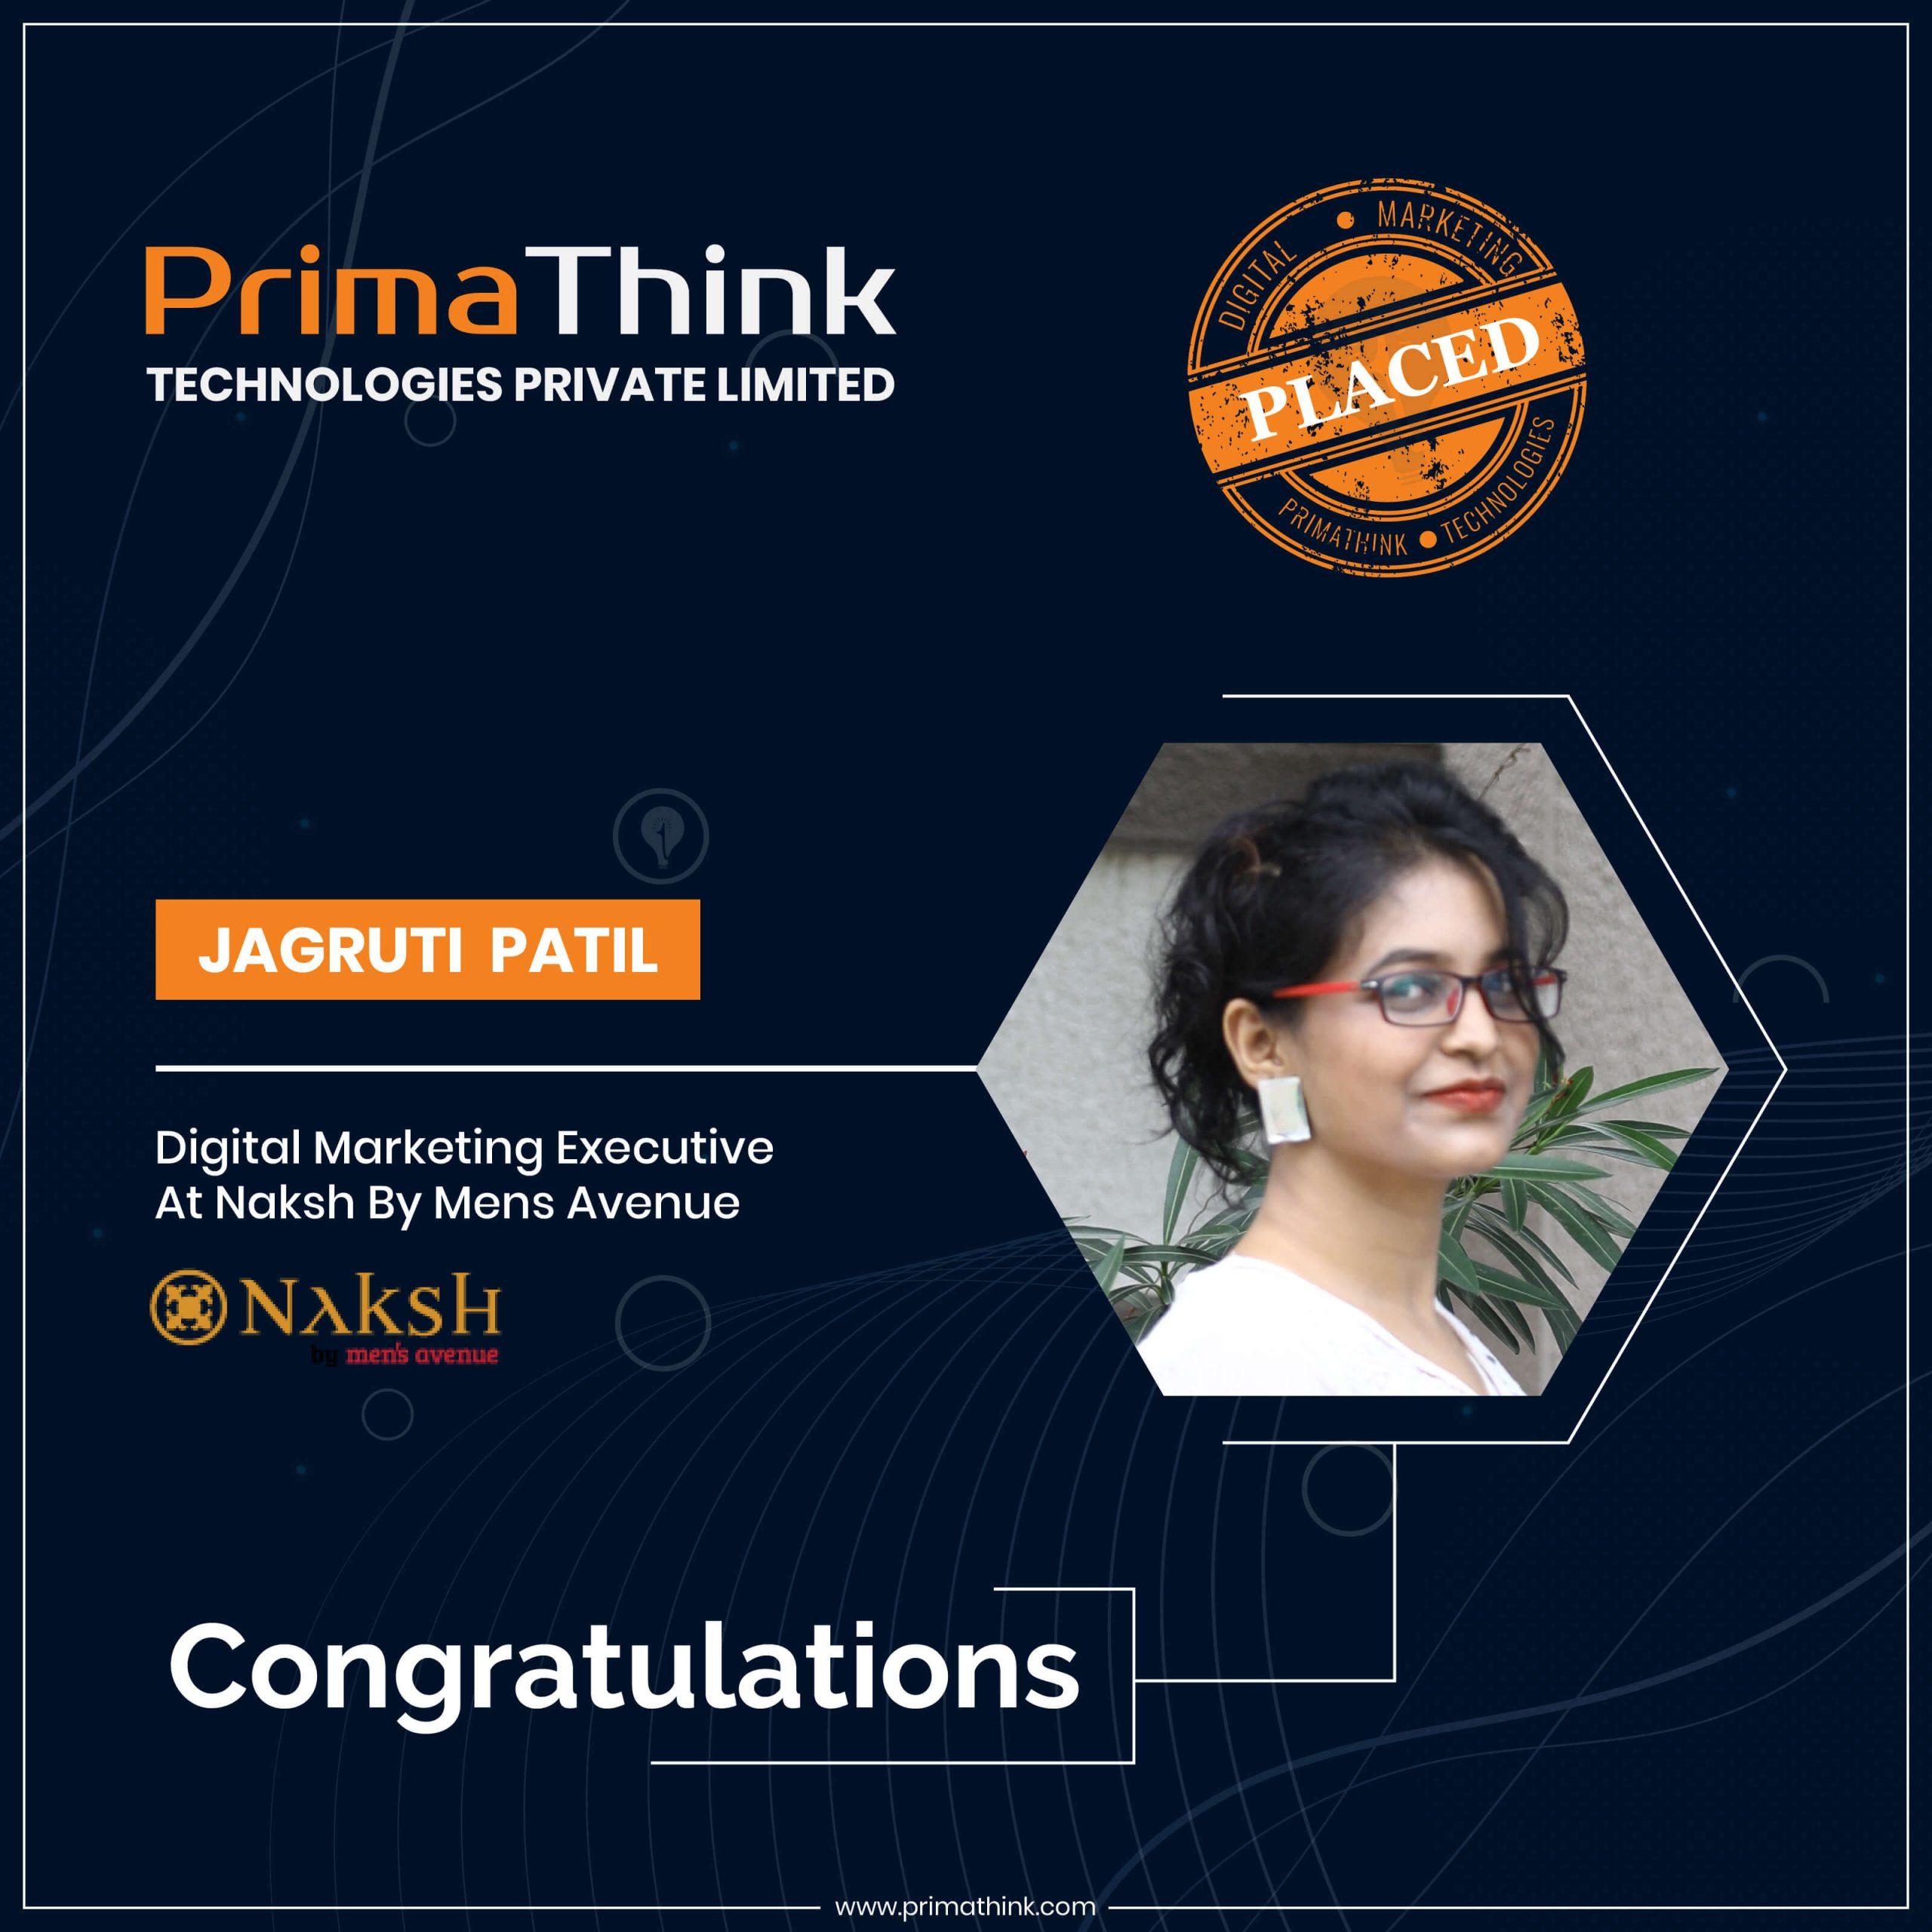 jagruti placed by digital marketing training primathink